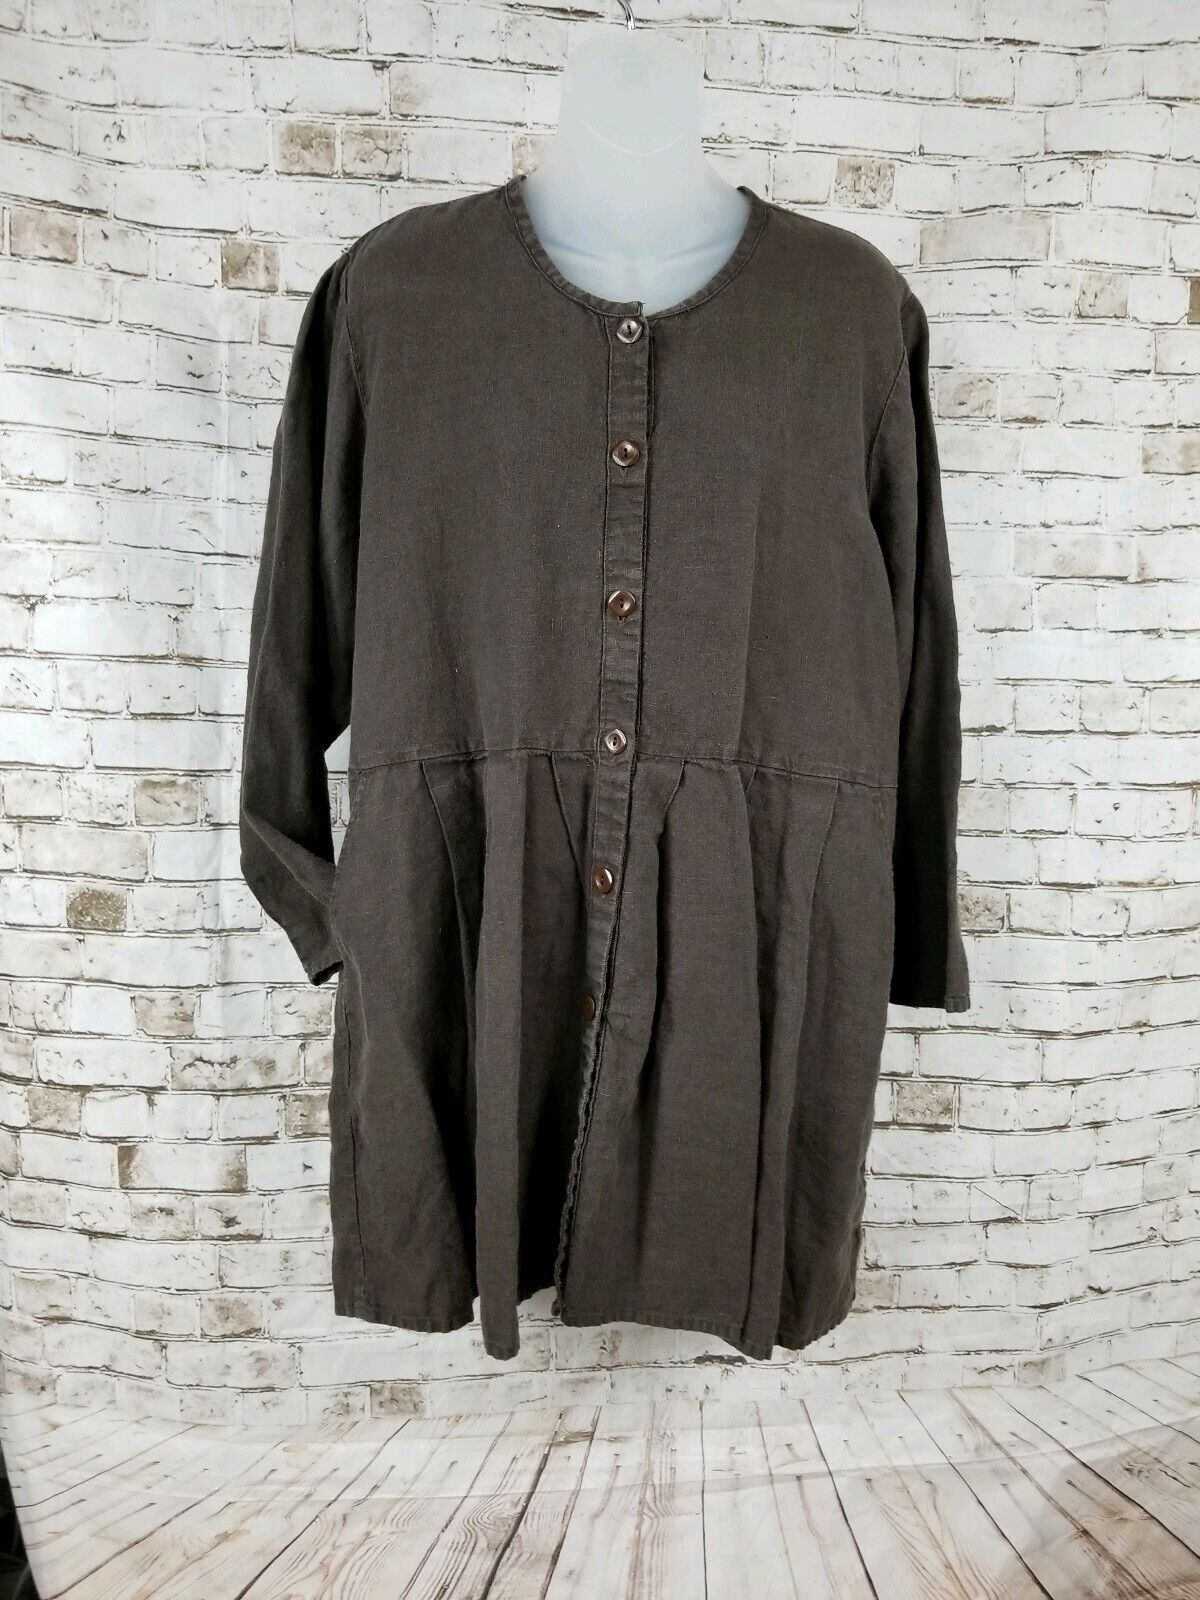 Flax brand clothing for petite women, auberge petite madeleine